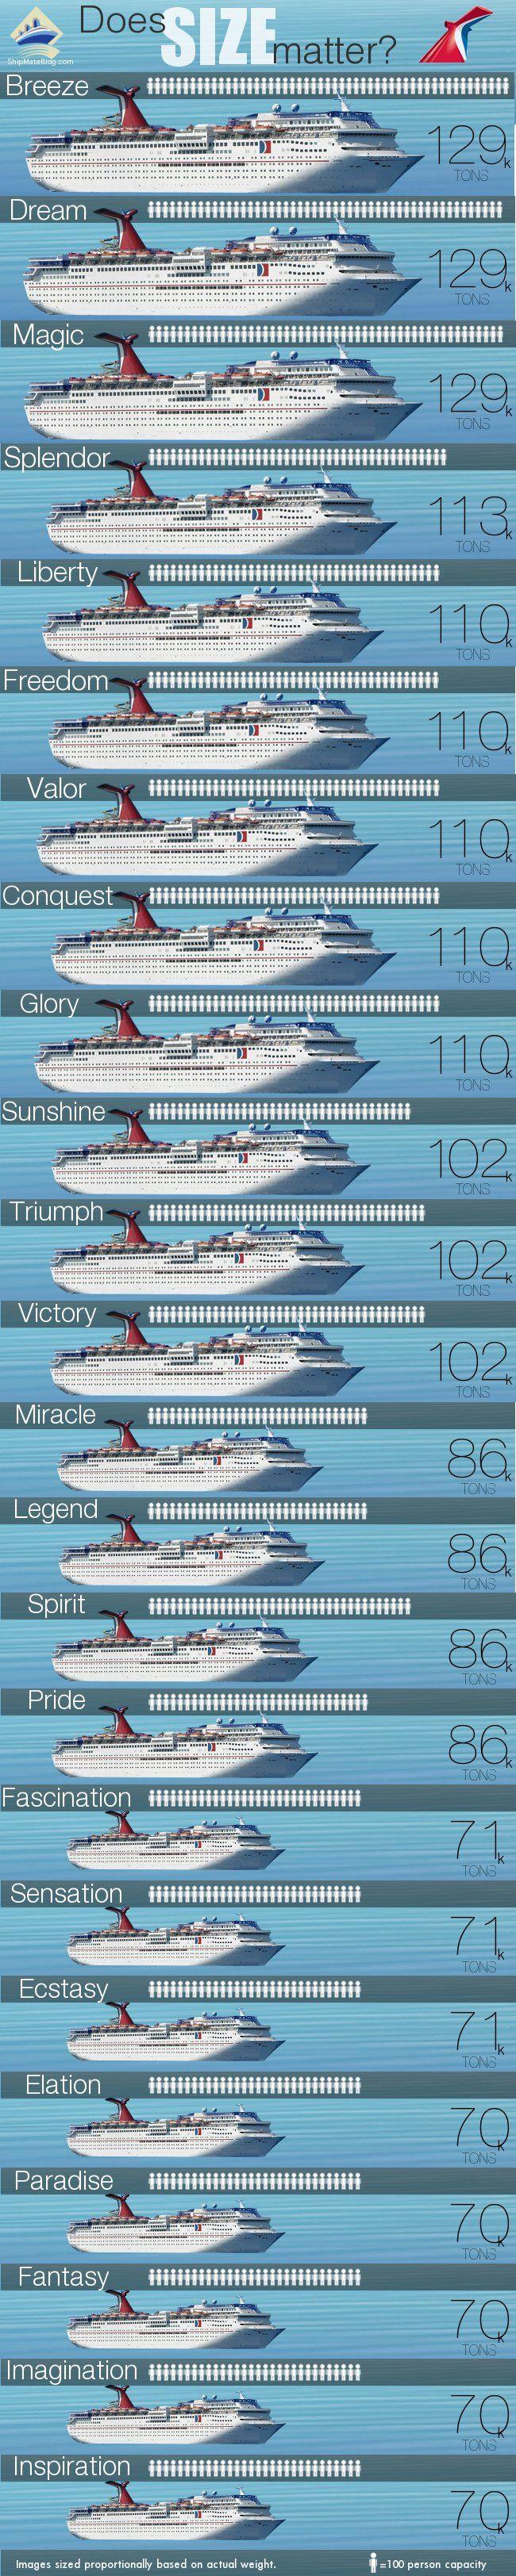 Size Matters - Carnival Cruise Ships Size Comparison.